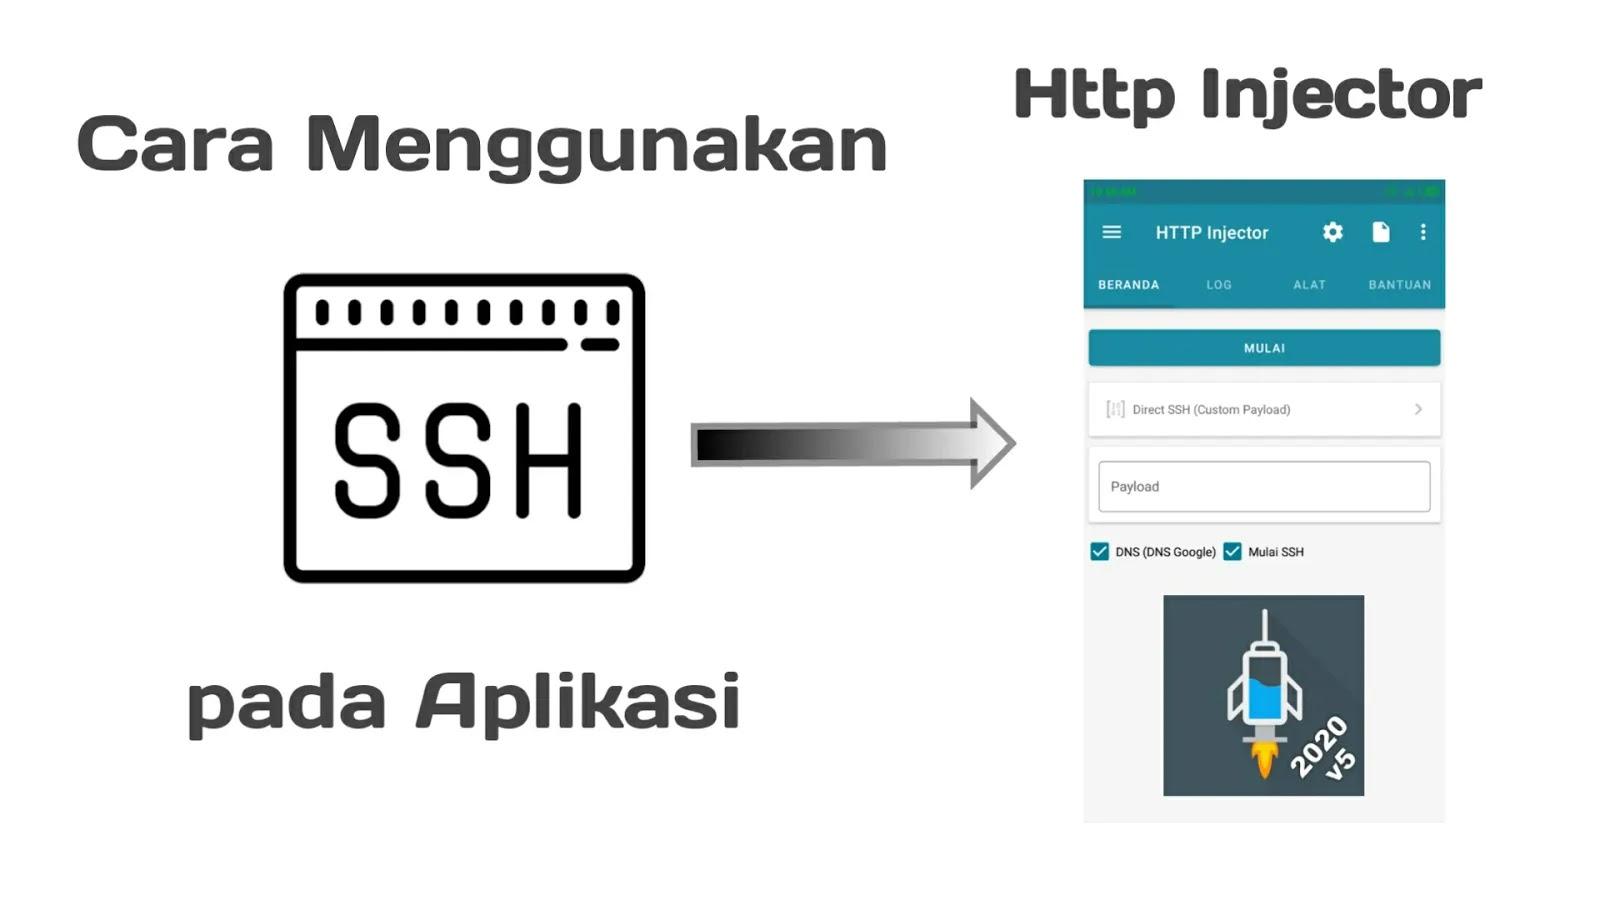 Cara Menggunakan SSH di Aplikasi HTTP Injector Android